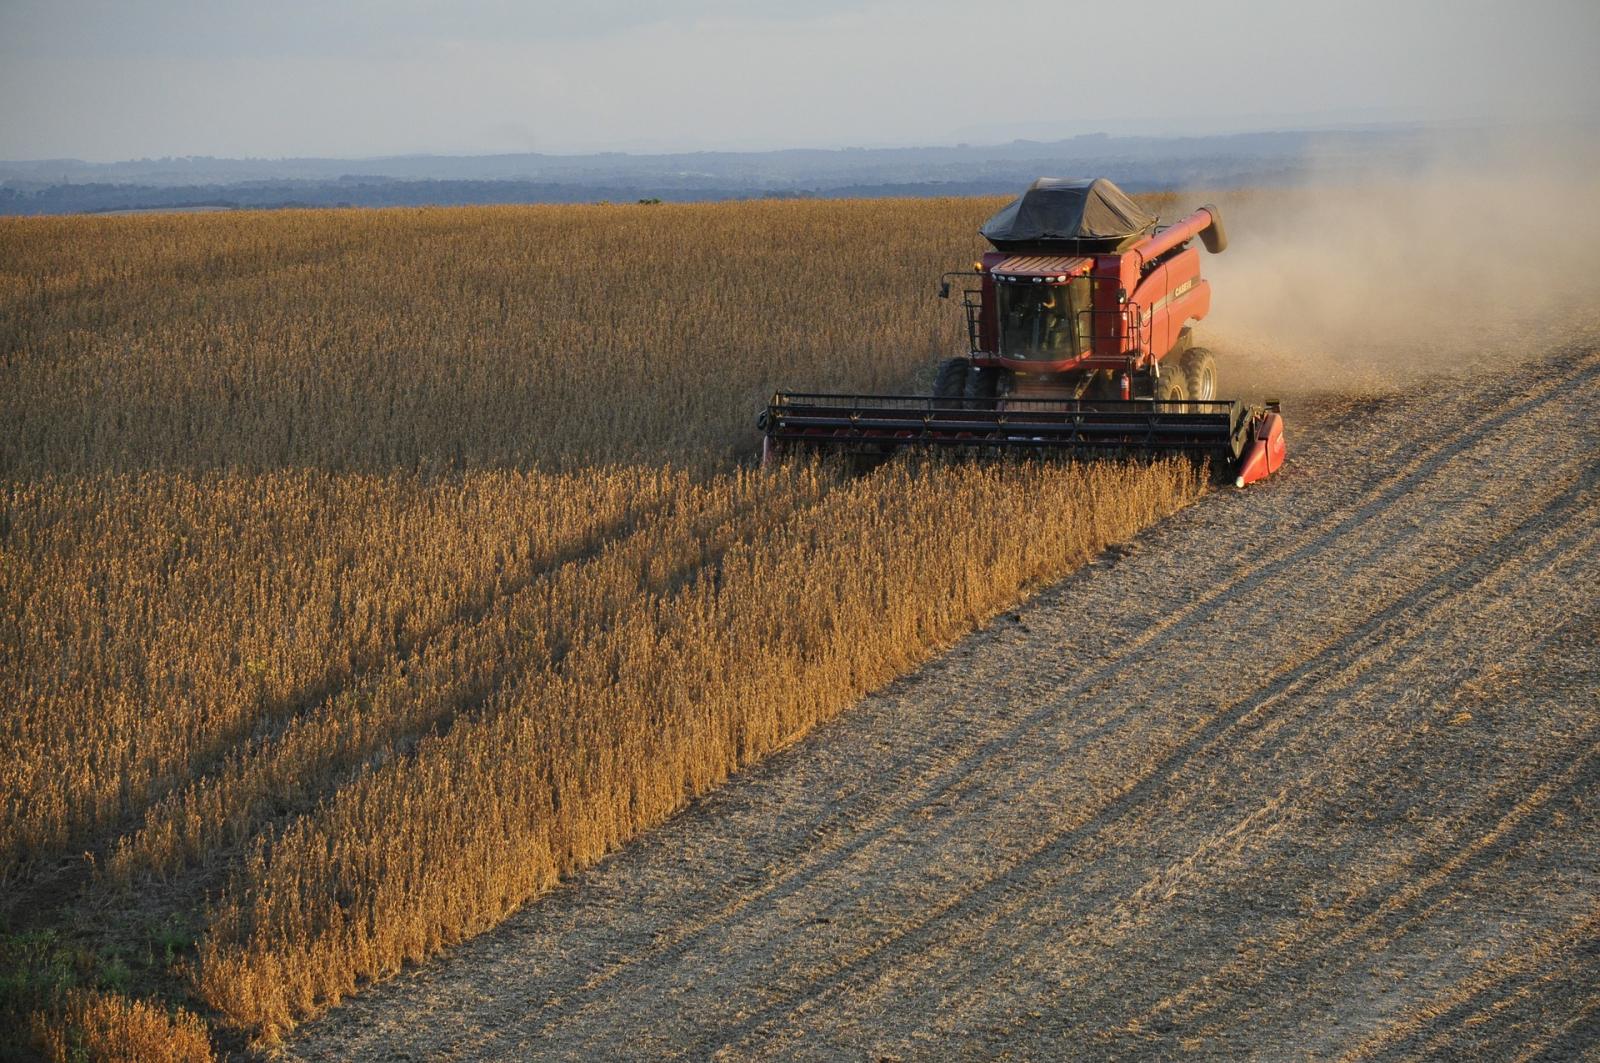 Soybean intensive farming credit Pixabay